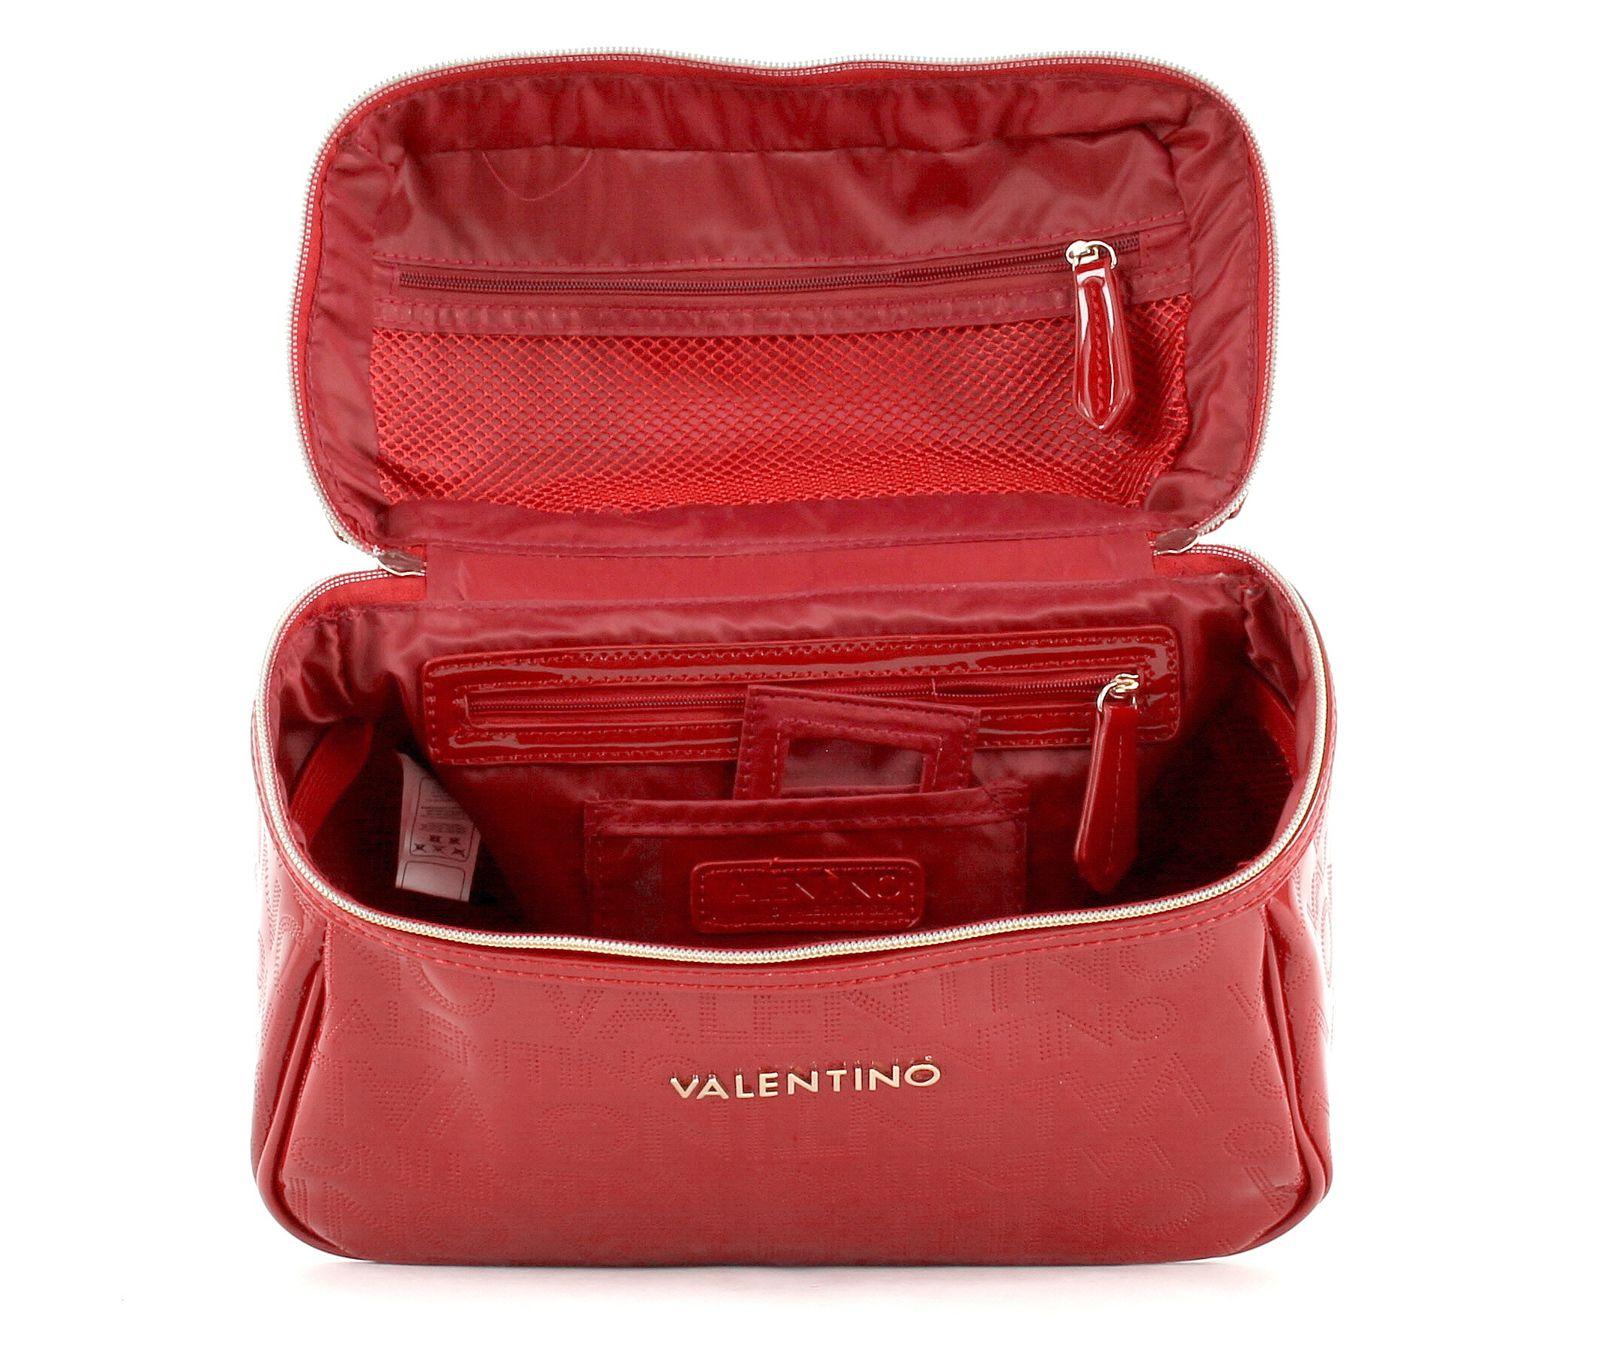 valentino alma beauty case tasche kosmetiktasche rot rosso. Black Bedroom Furniture Sets. Home Design Ideas